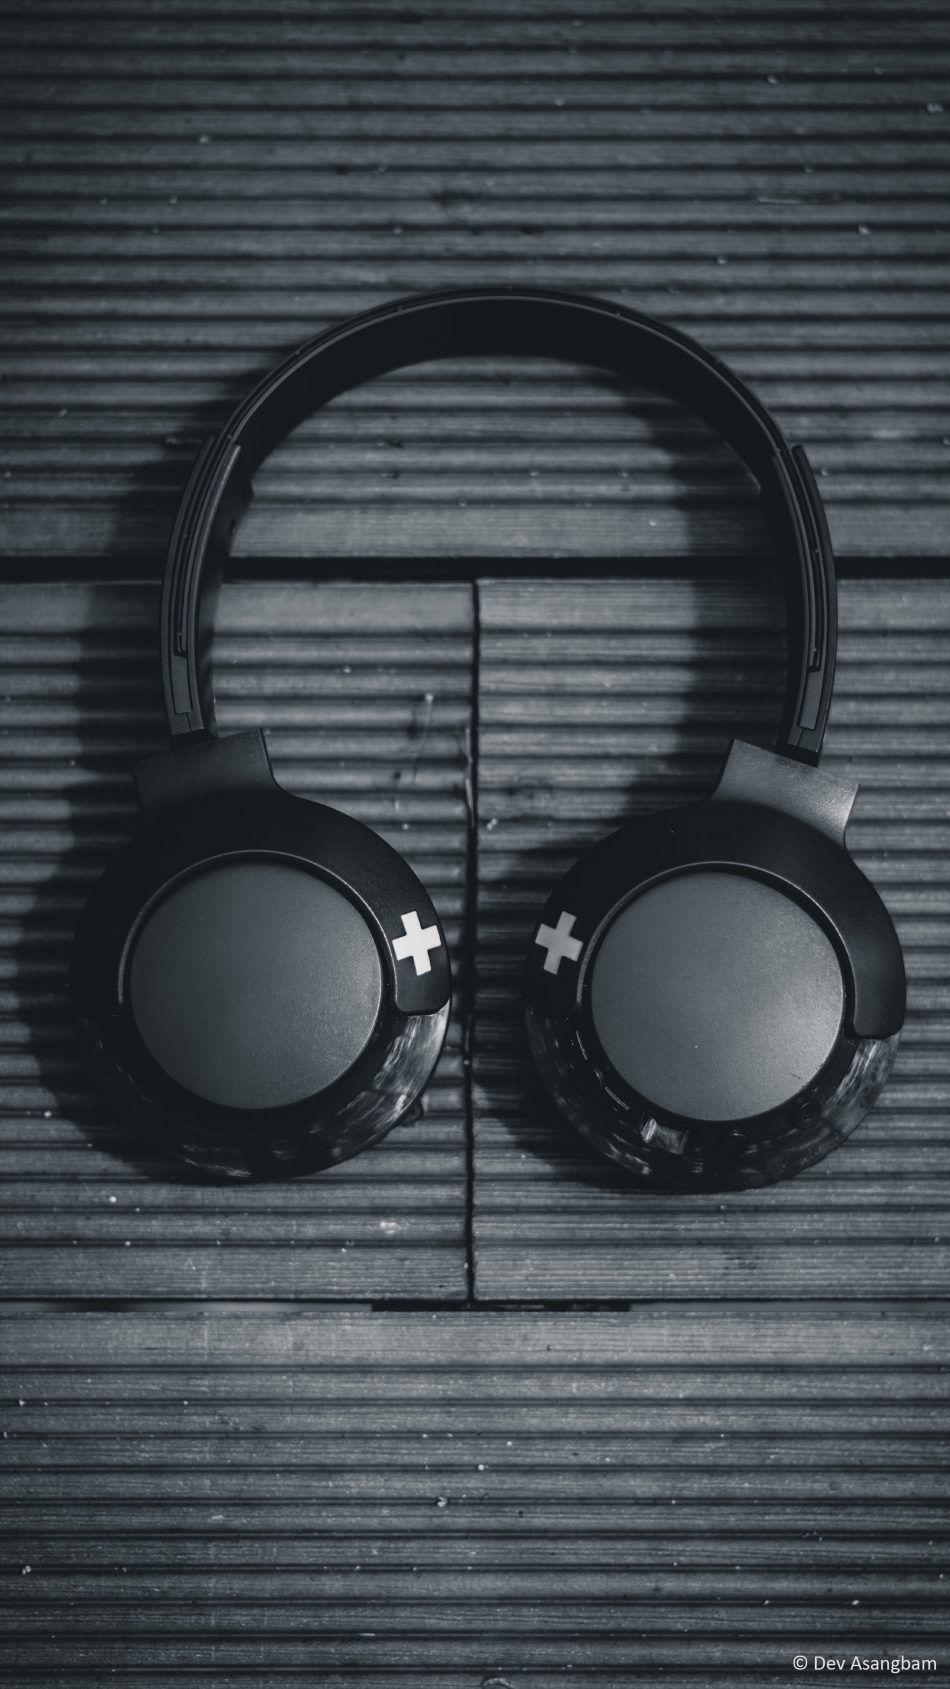 Headphone Wireless Music Black White 4k Ultra Hd Mobile Wallpaper Wireless Music Wireless Headphones Music Wallpaper